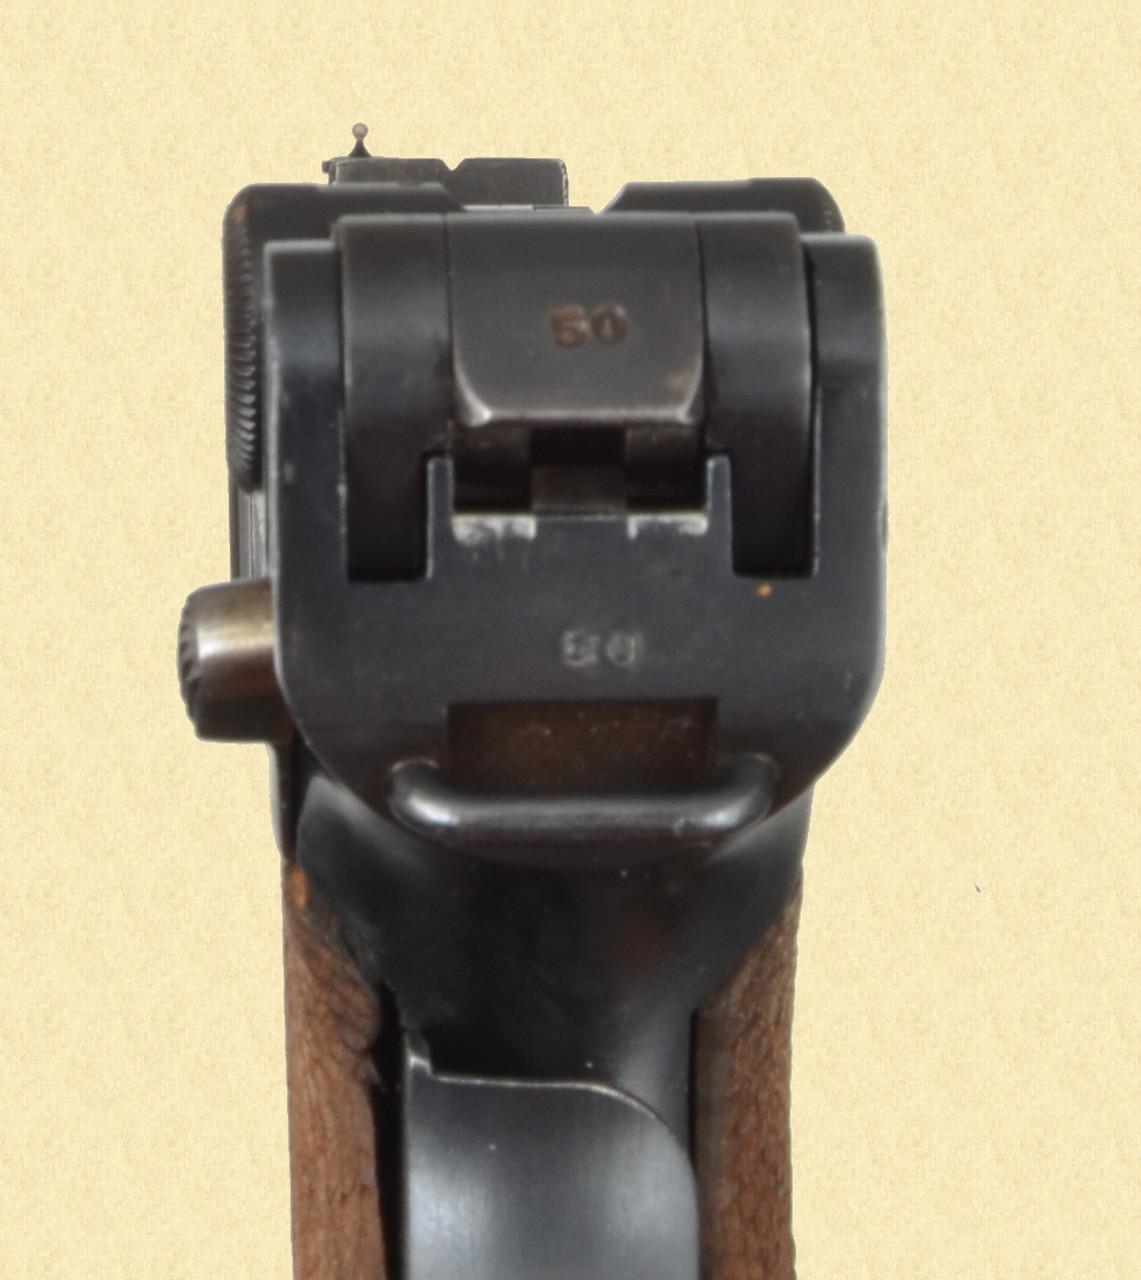 DWM 1920 CARBINE 9MM - D32155